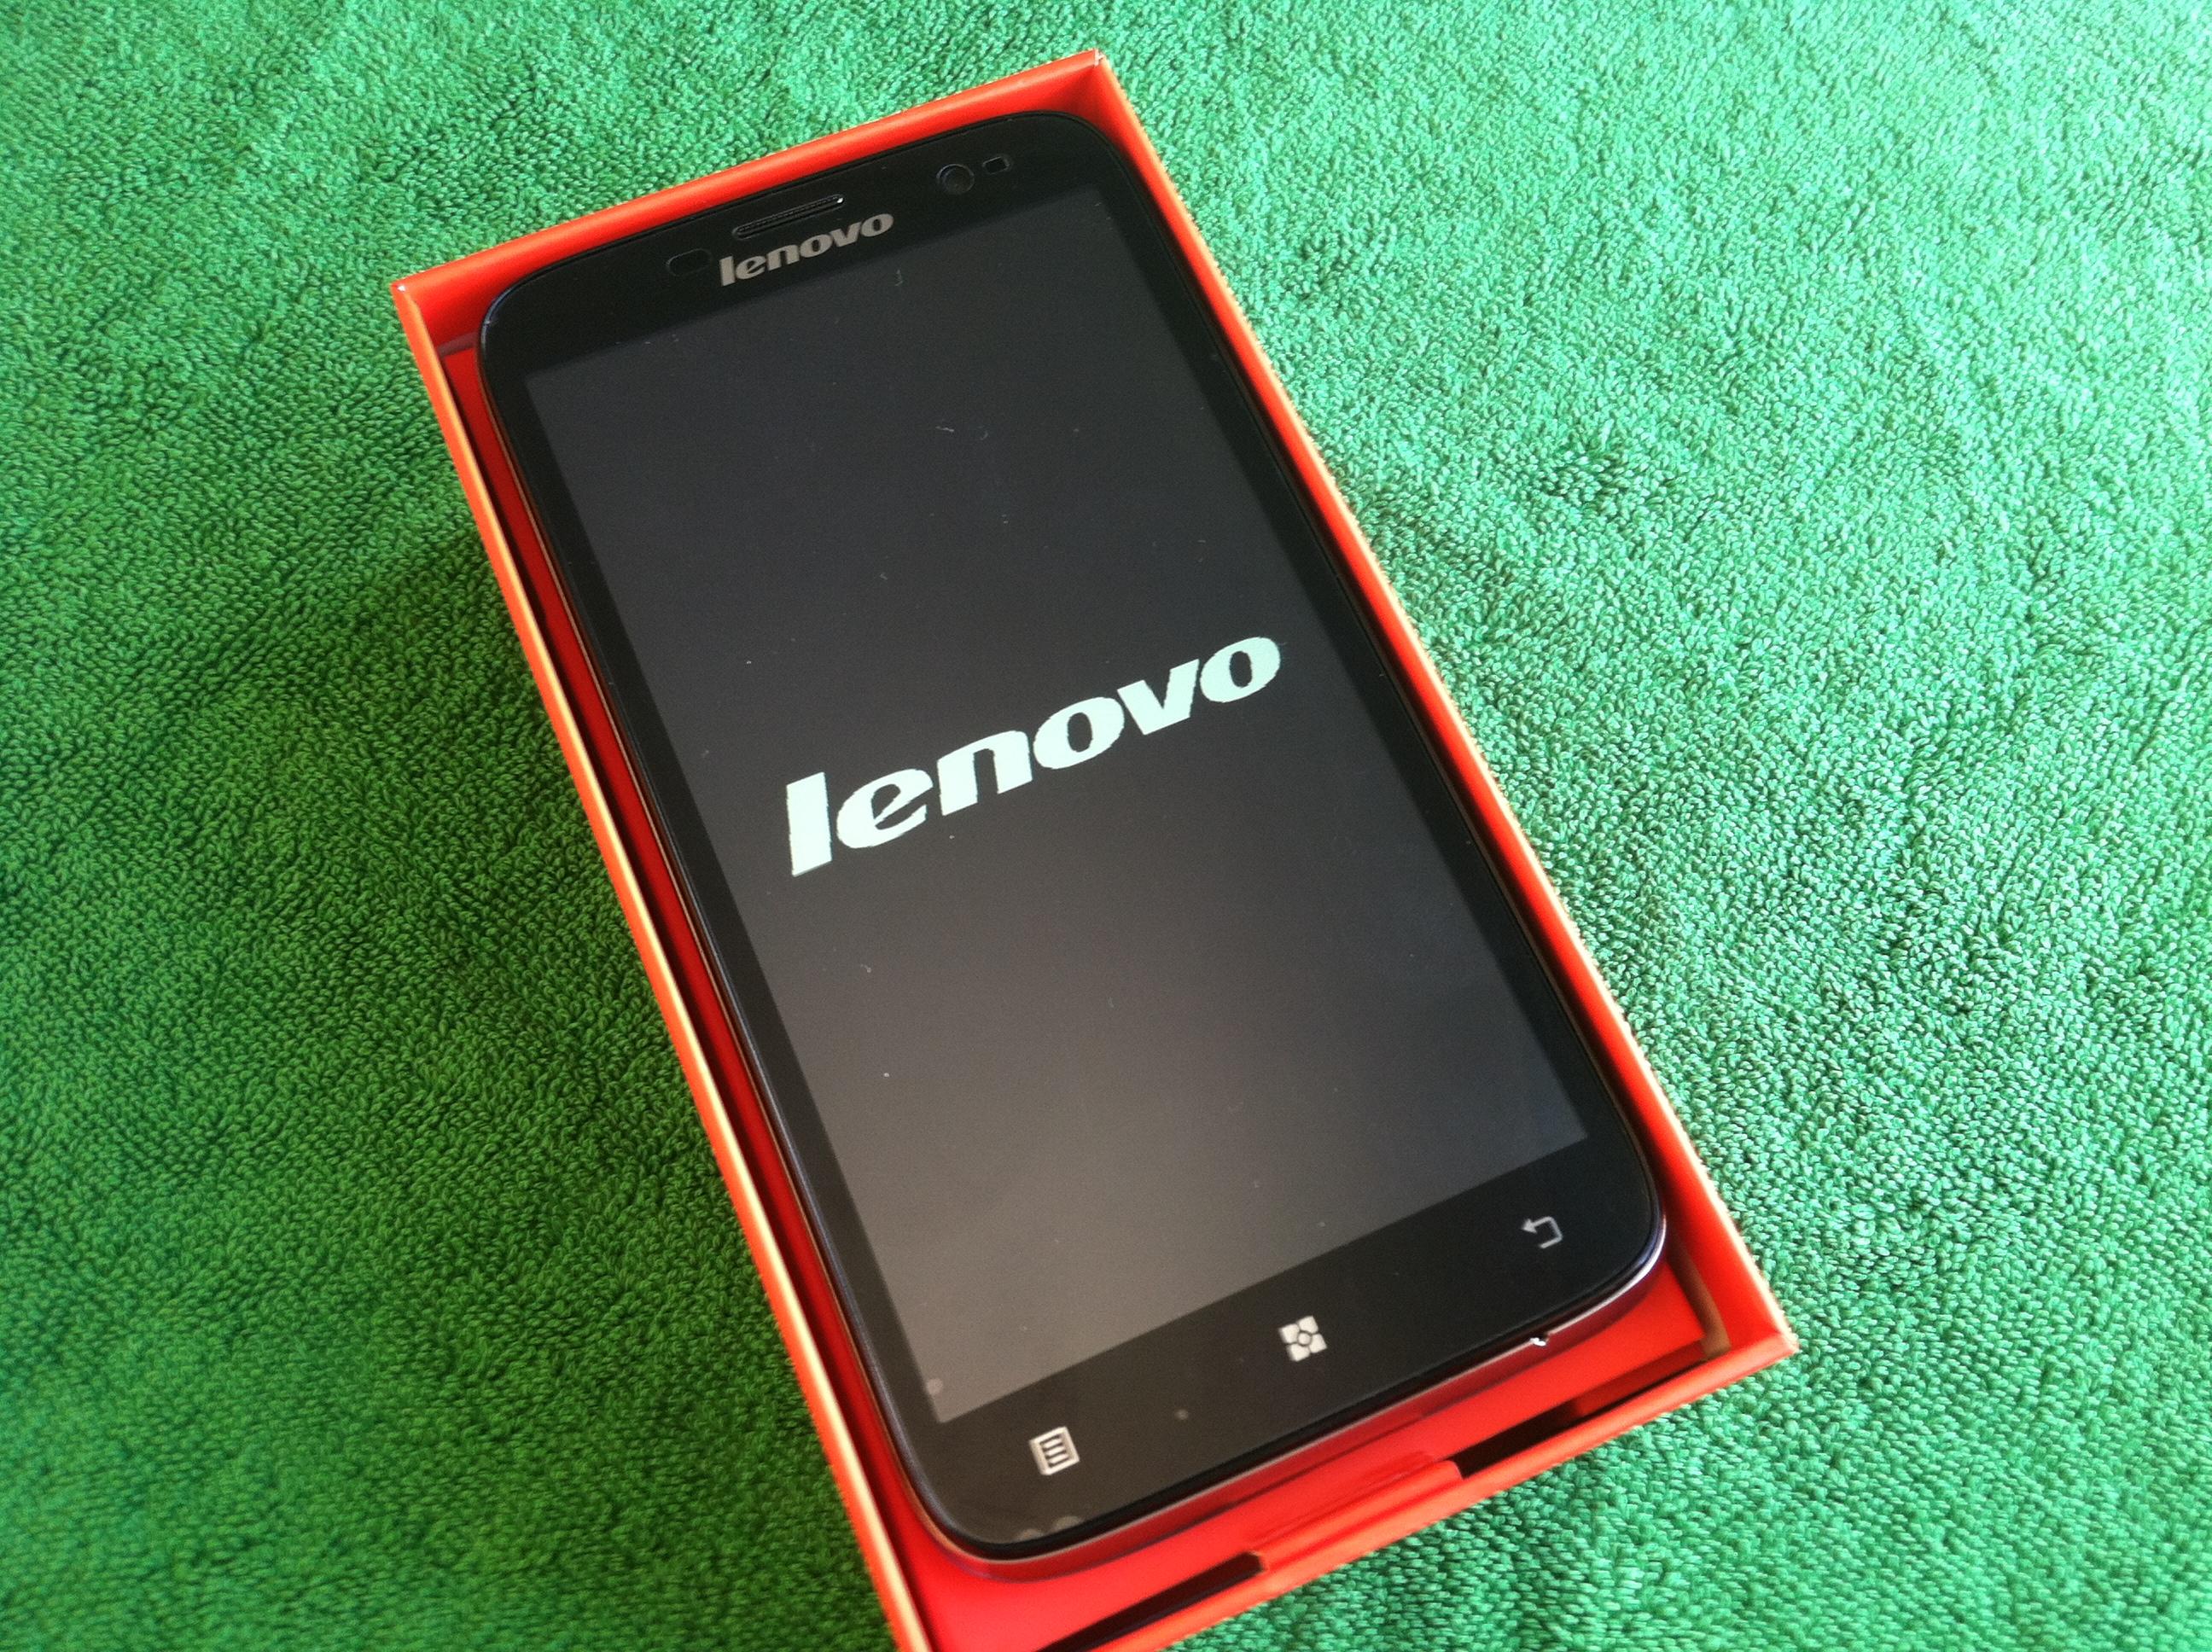 Lenovo A850 Smartphone